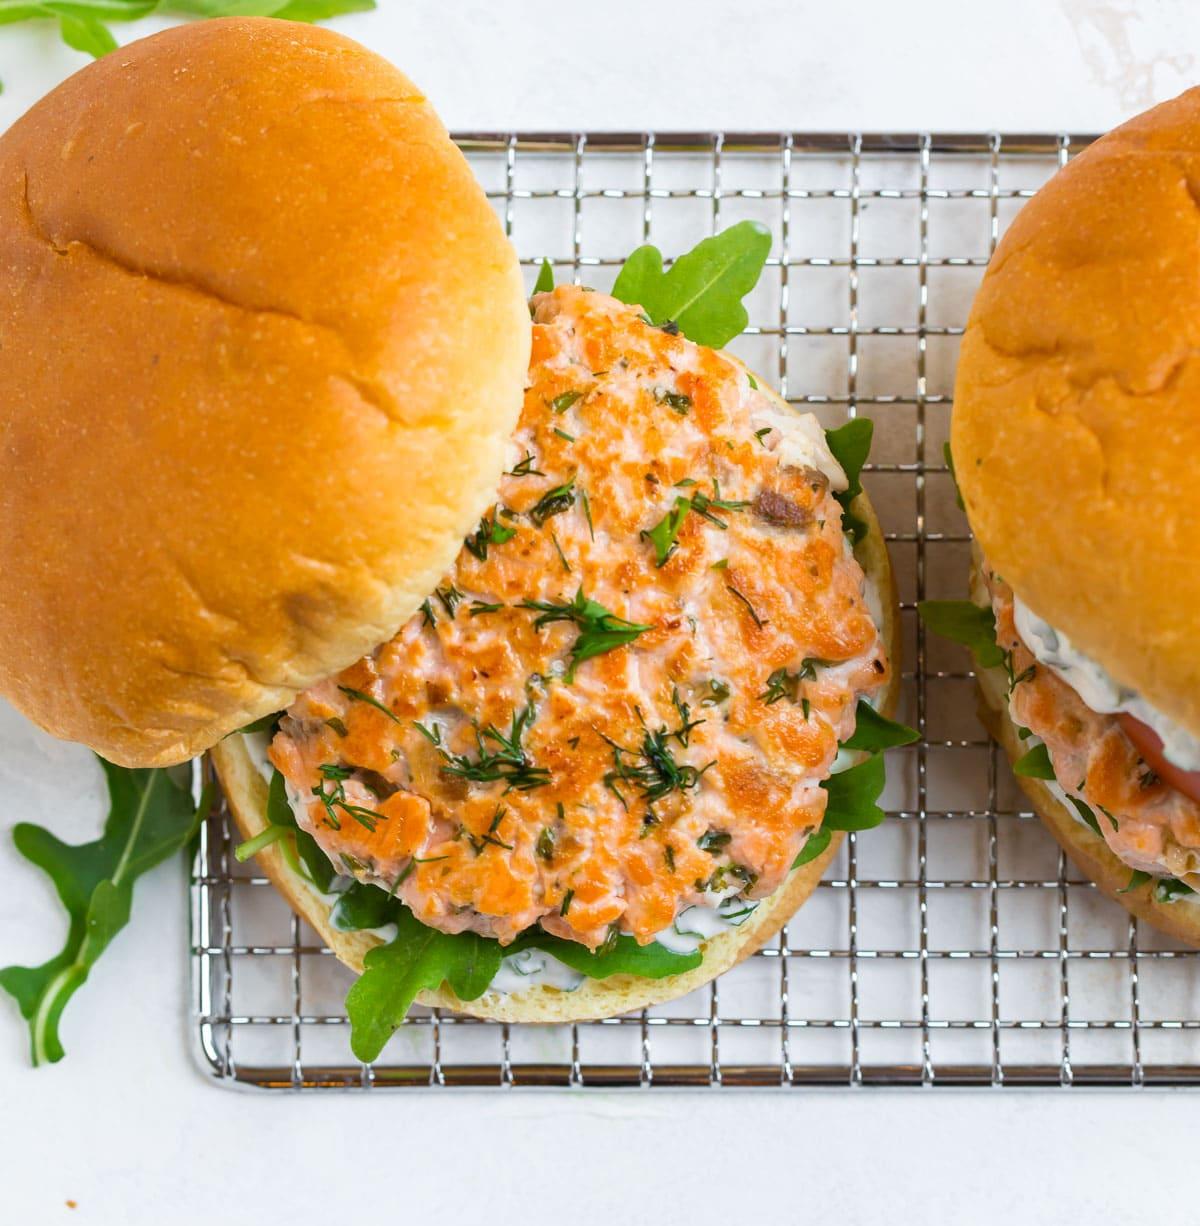 Salmon burger on a bun with arugula